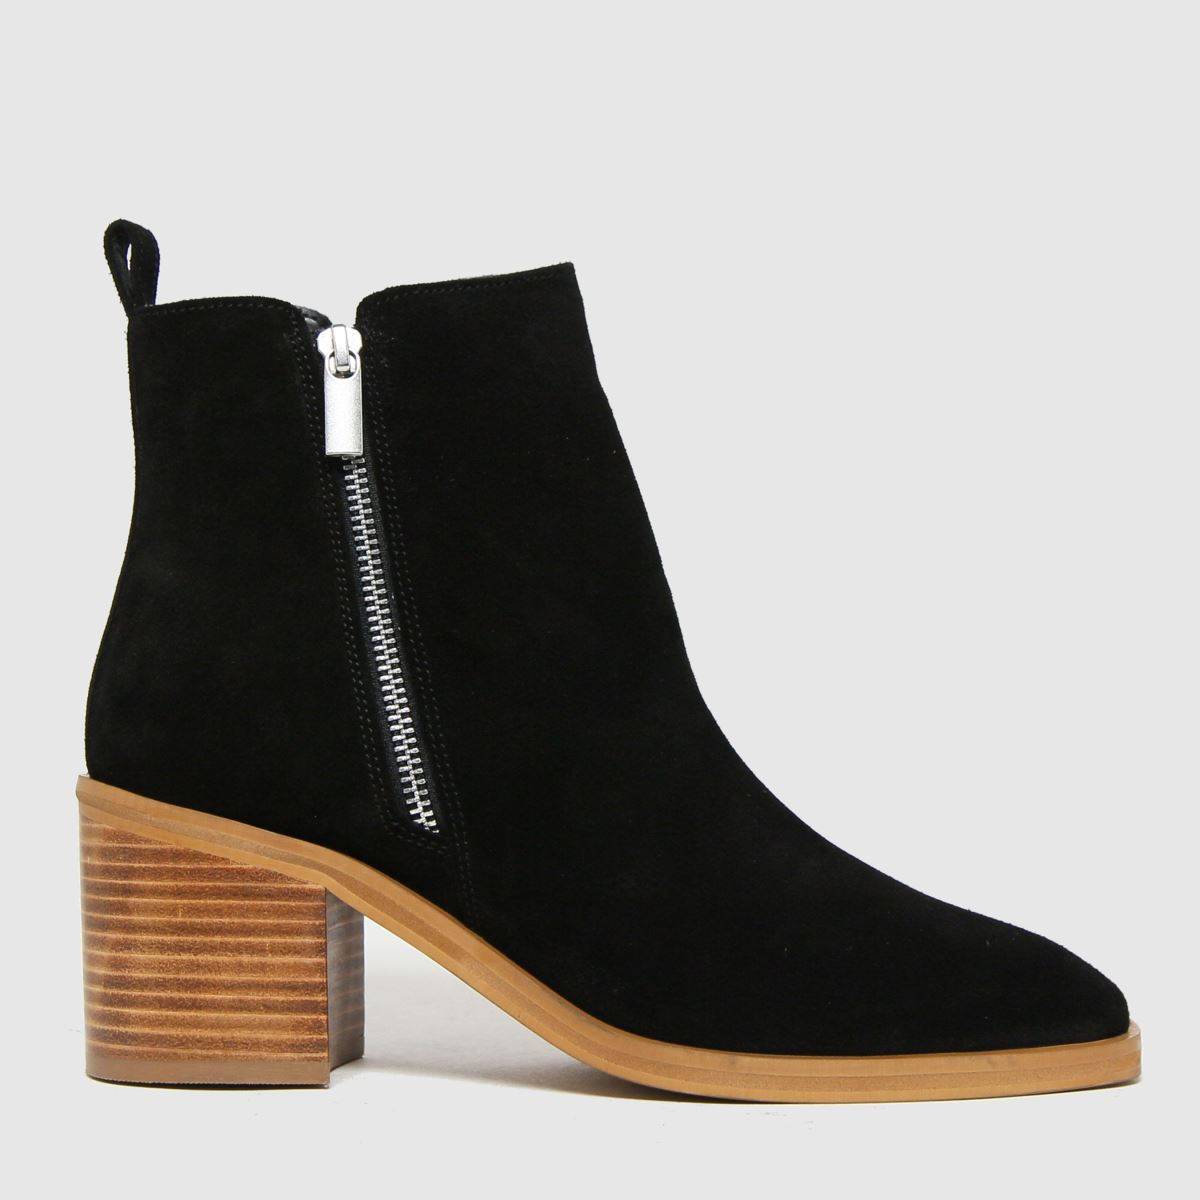 Schuh Black Celeste Suede Side Zip Boots